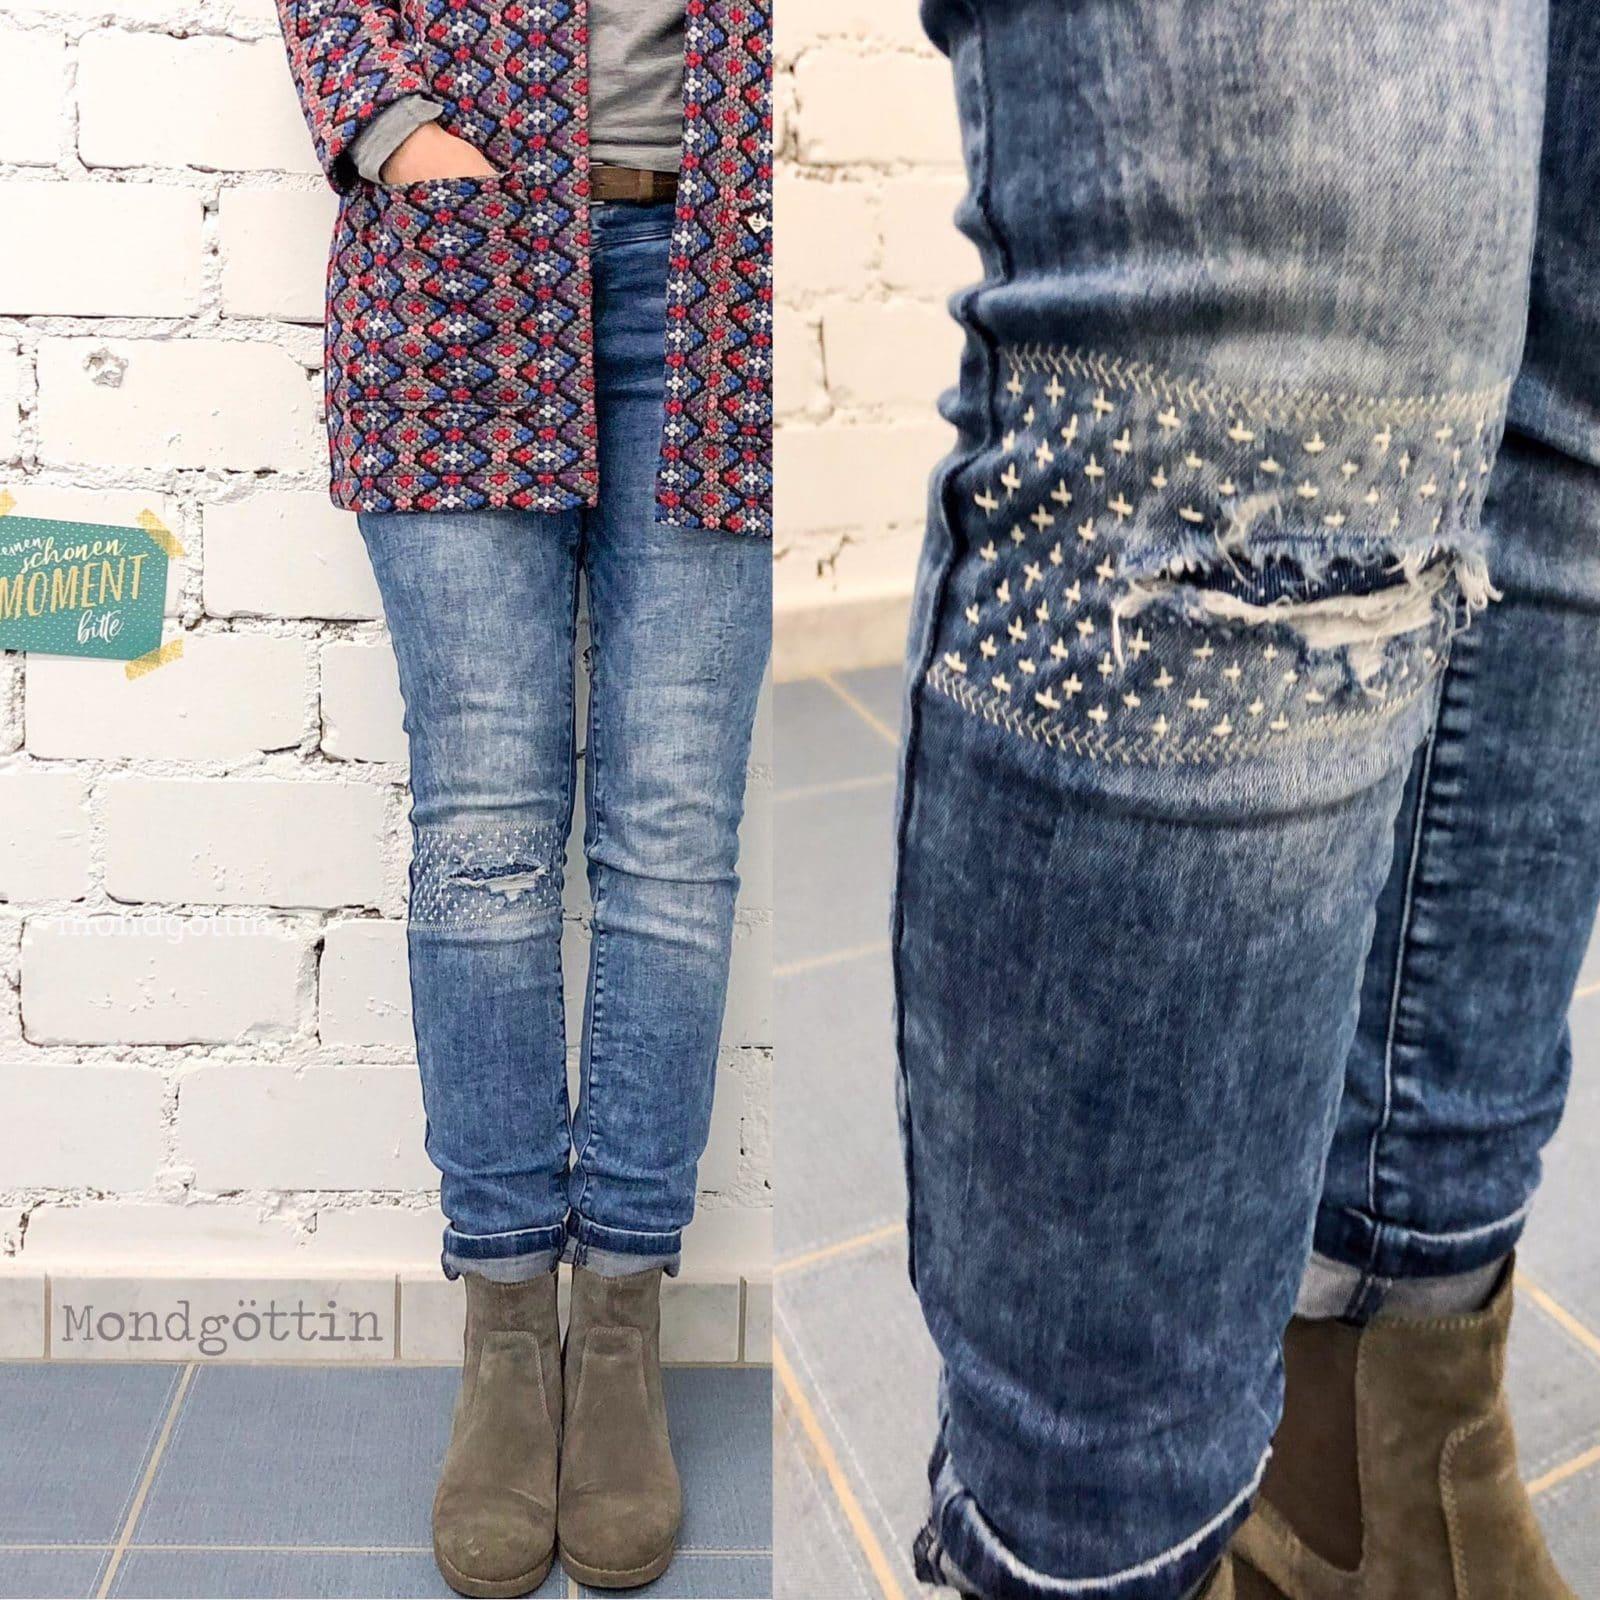 cf86adcad937 Jeans flicken // visible mending - HANDMADE Kultur